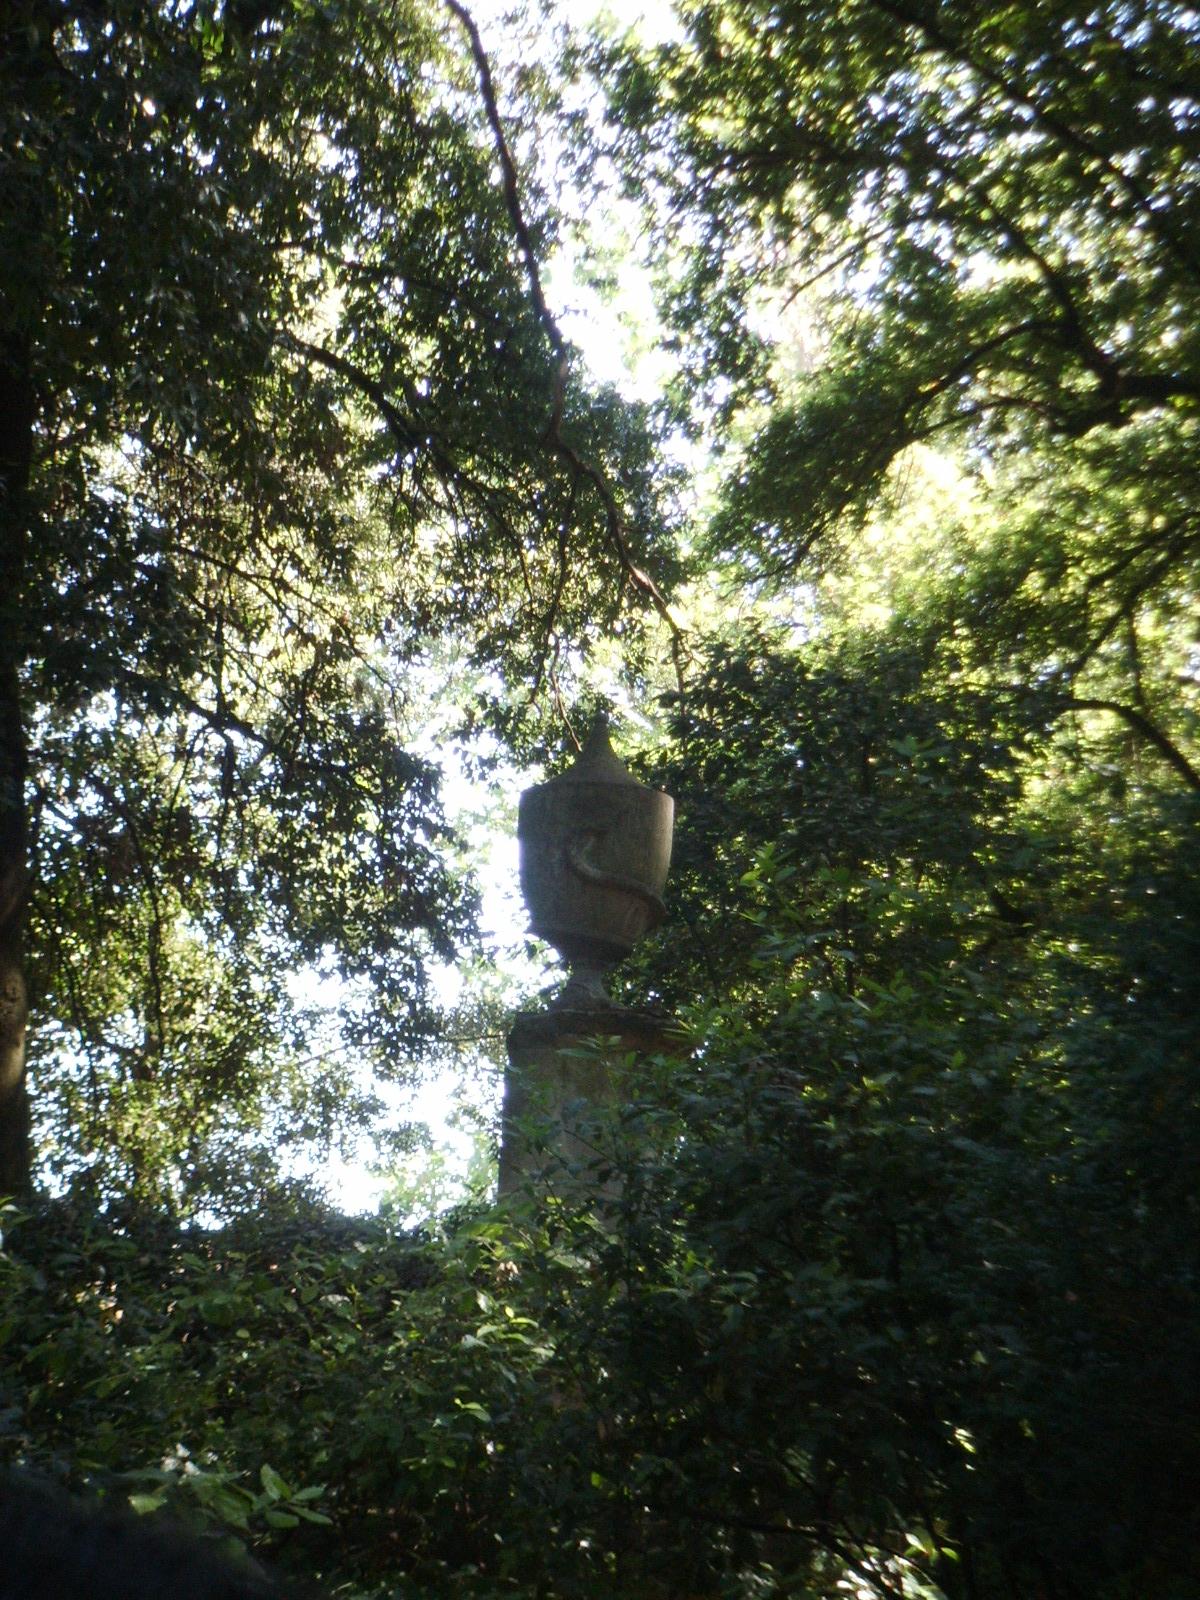 File giardino torrigiani urna con serpente jpg for Giardino torrigiani